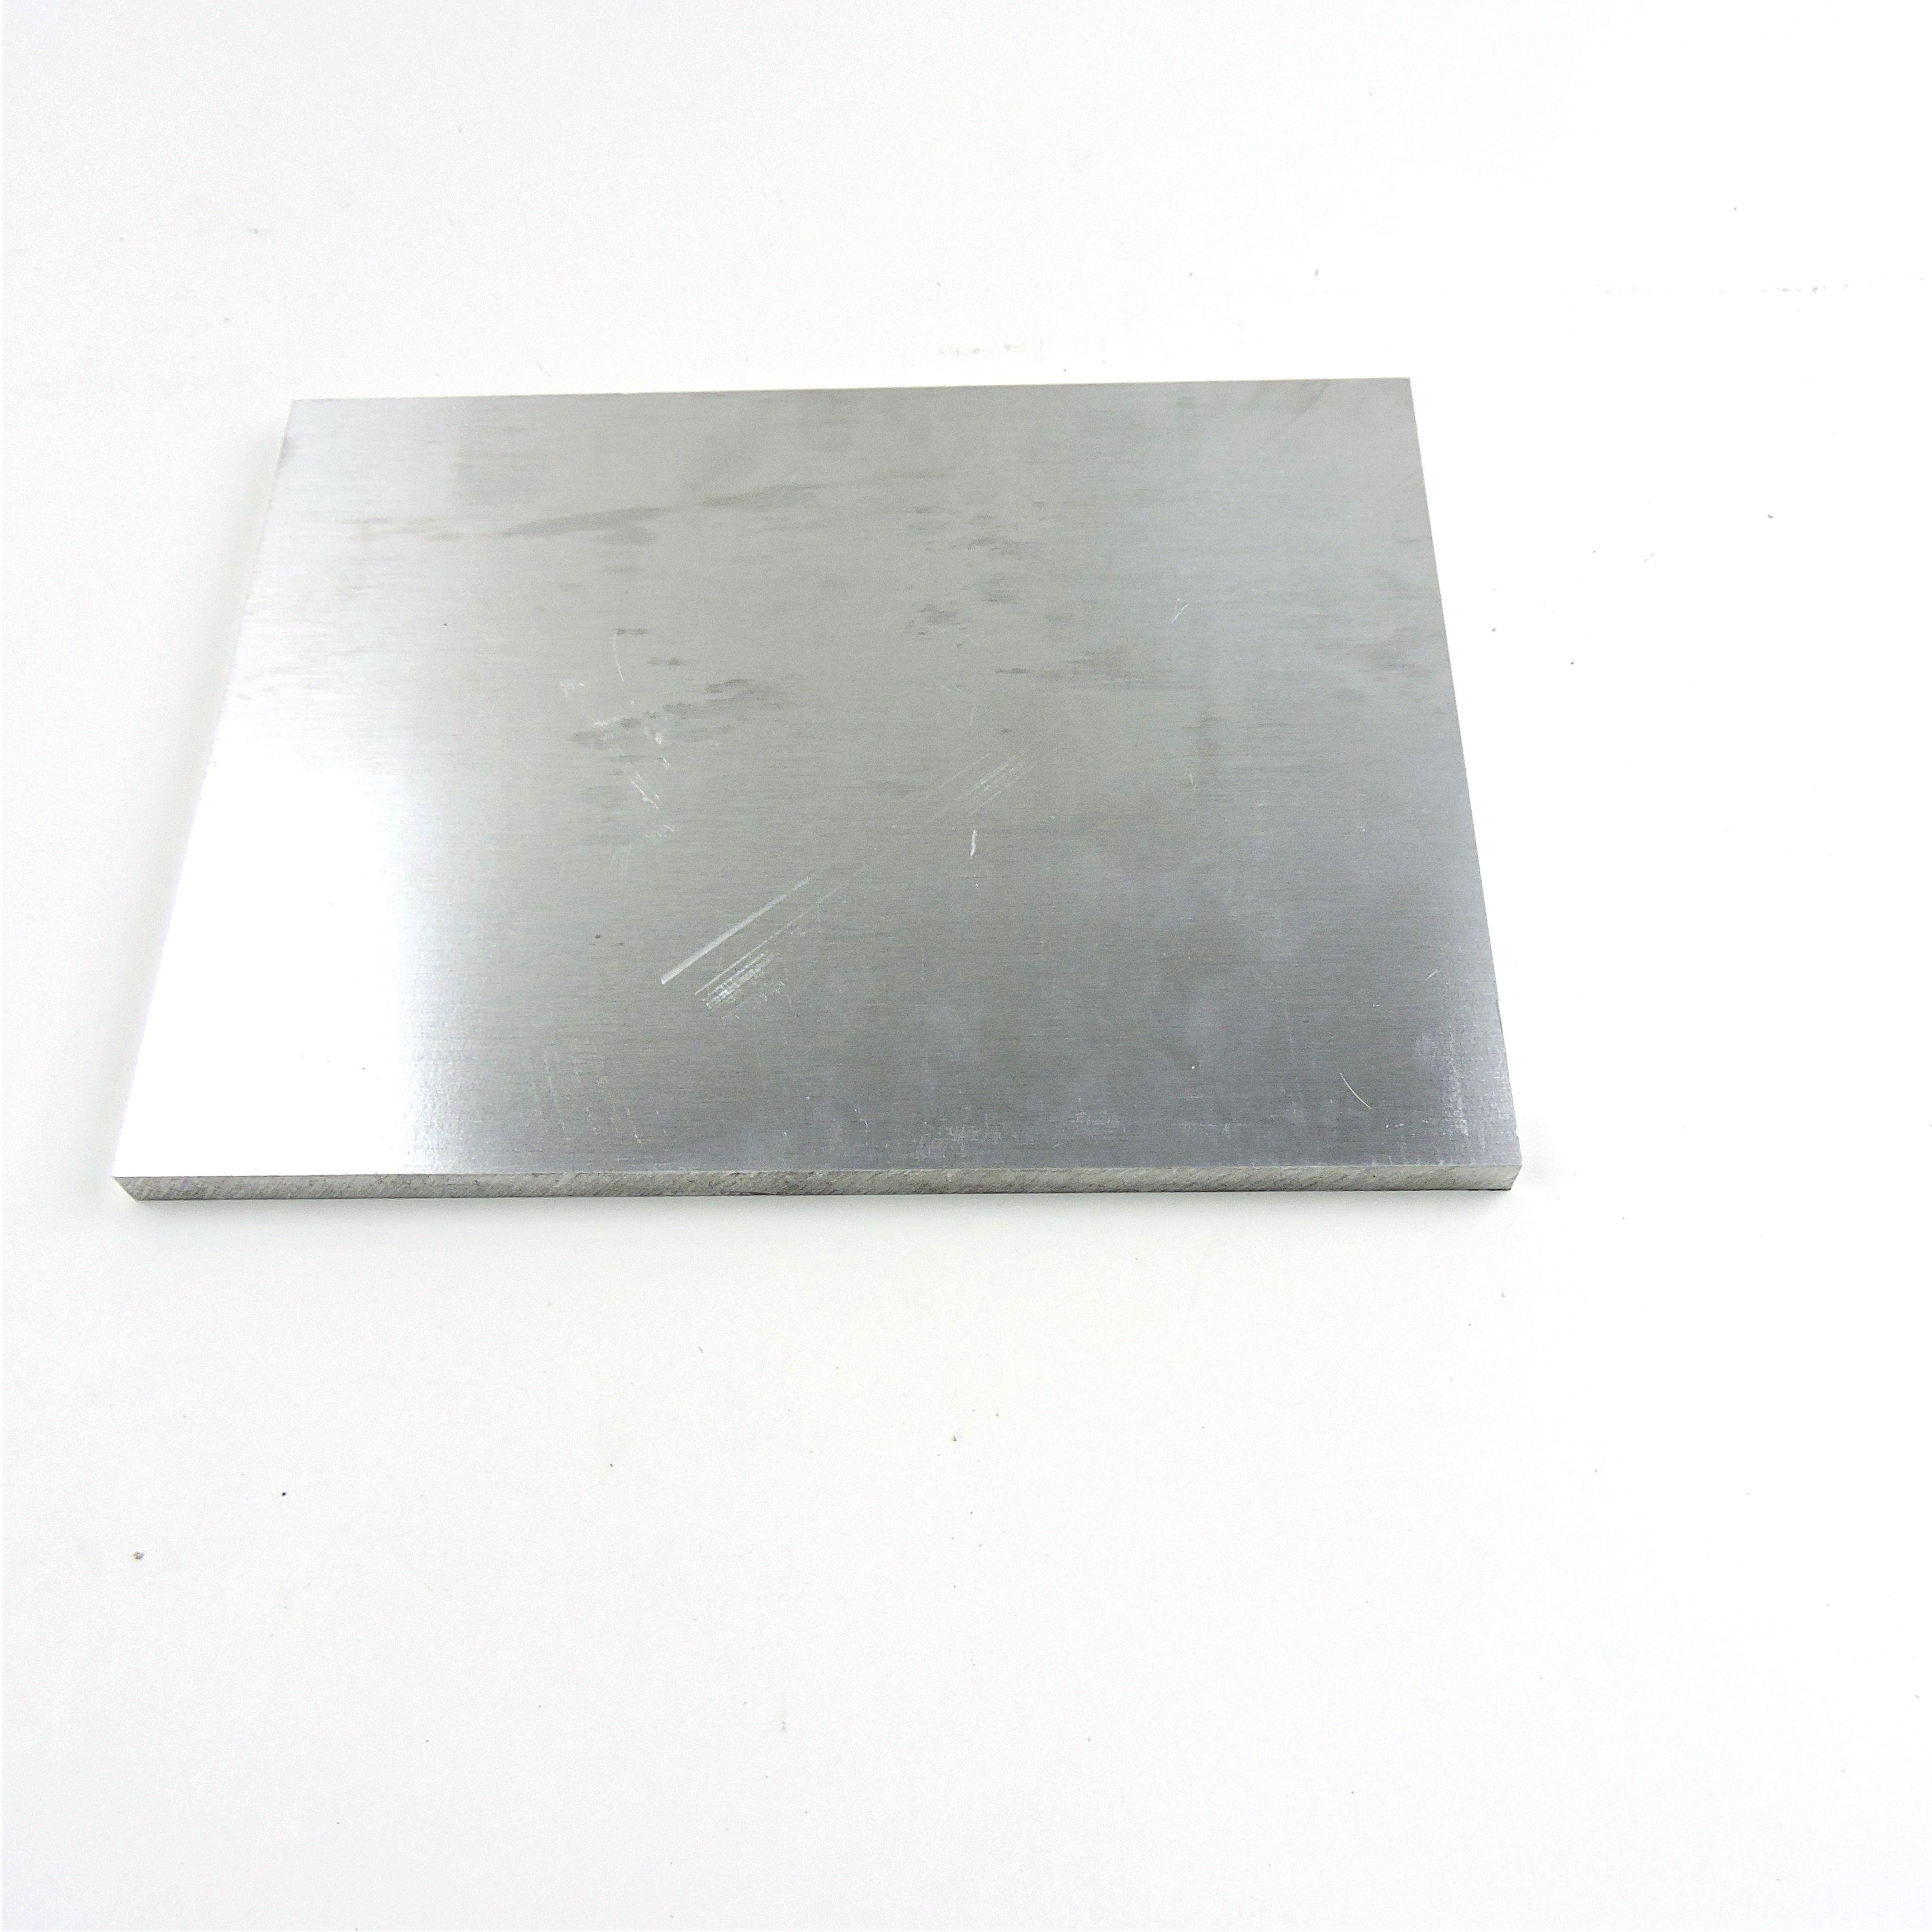 ".375/"" thick 6061 Aluminum PLATE  7.125/"" x 12.375/"" Long QTY 2  Stock sku122288"